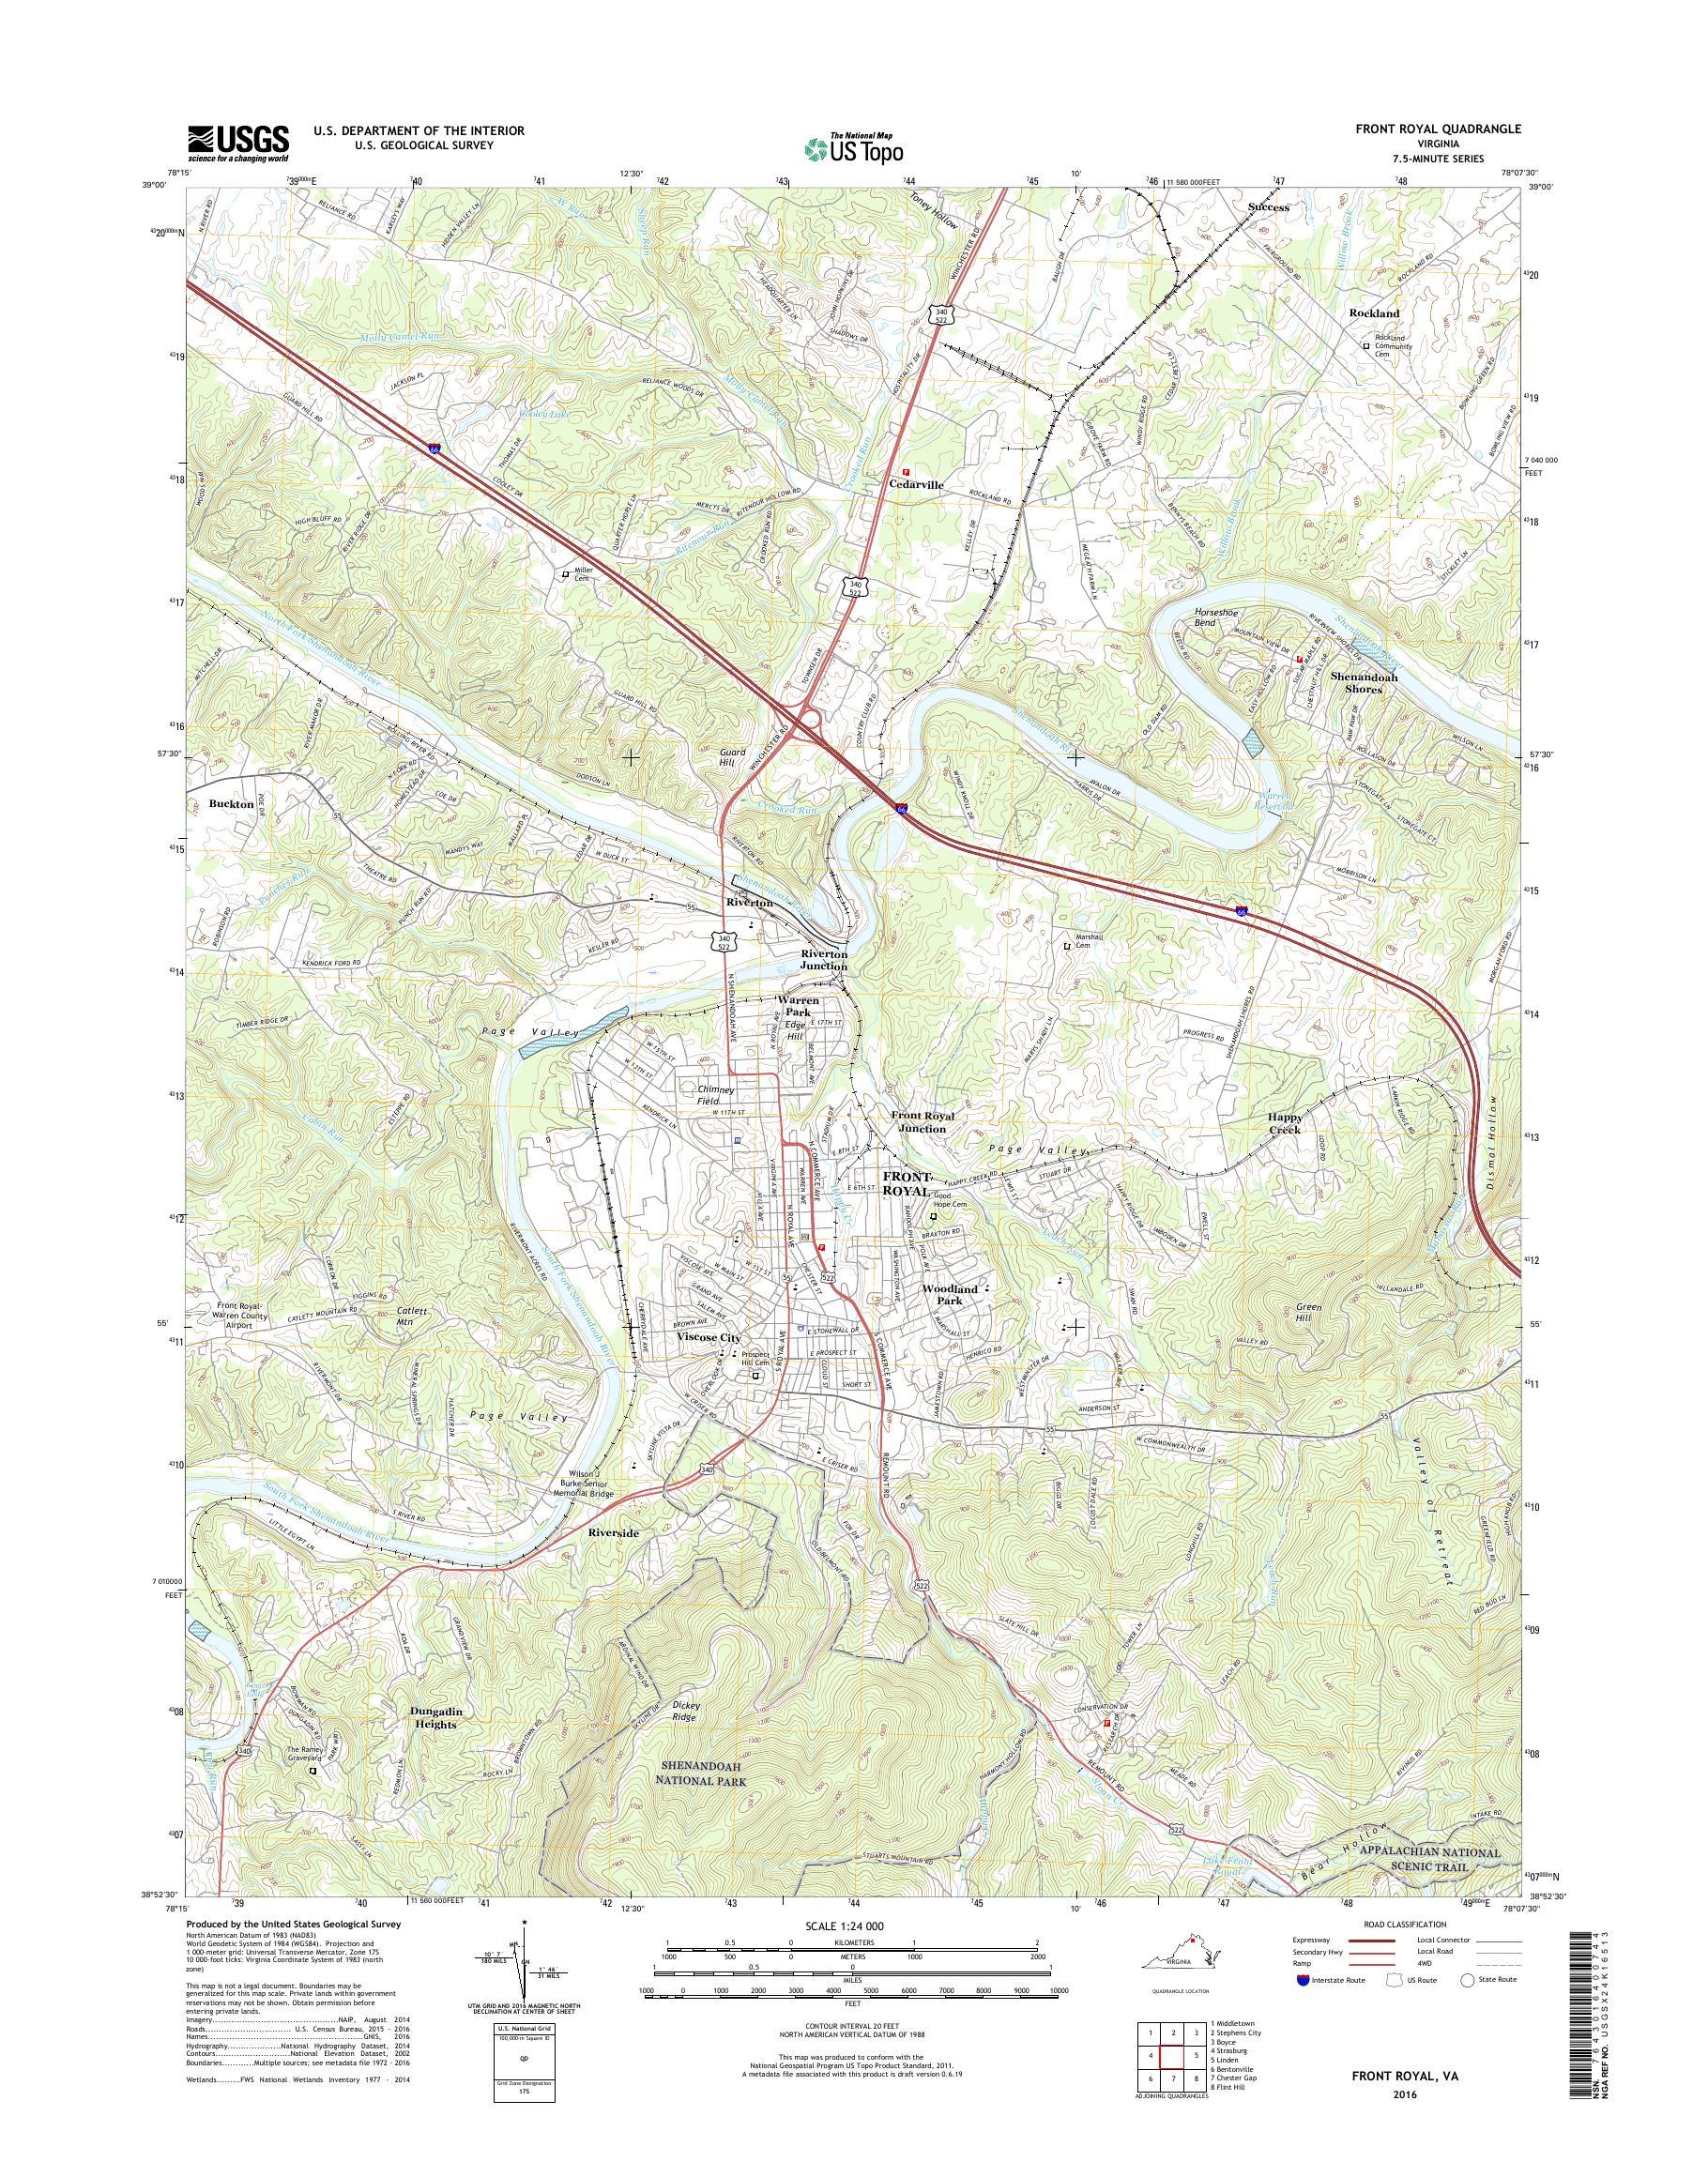 Mytopo Front Royal Virginia Usgs Quad Topo Map